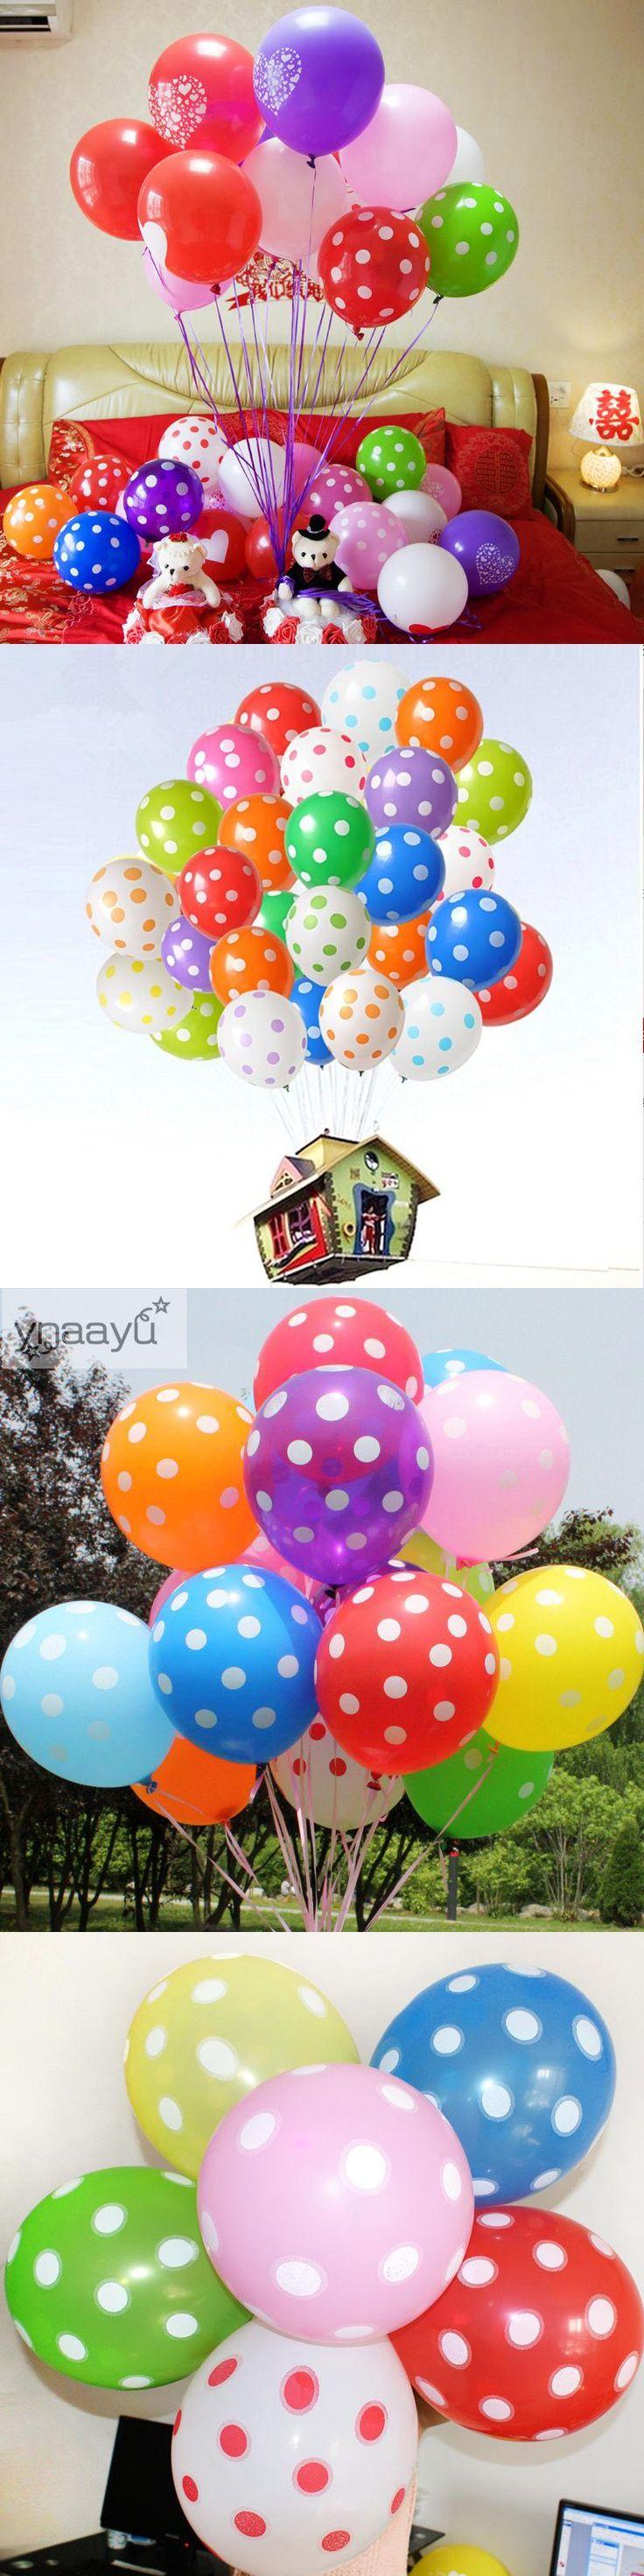 Ynaayu 20pcs/lot Latex Balloons Polka Dots Balloons 12 Inch Wedding Birthday Balloons Decoration Globos Party Ballon